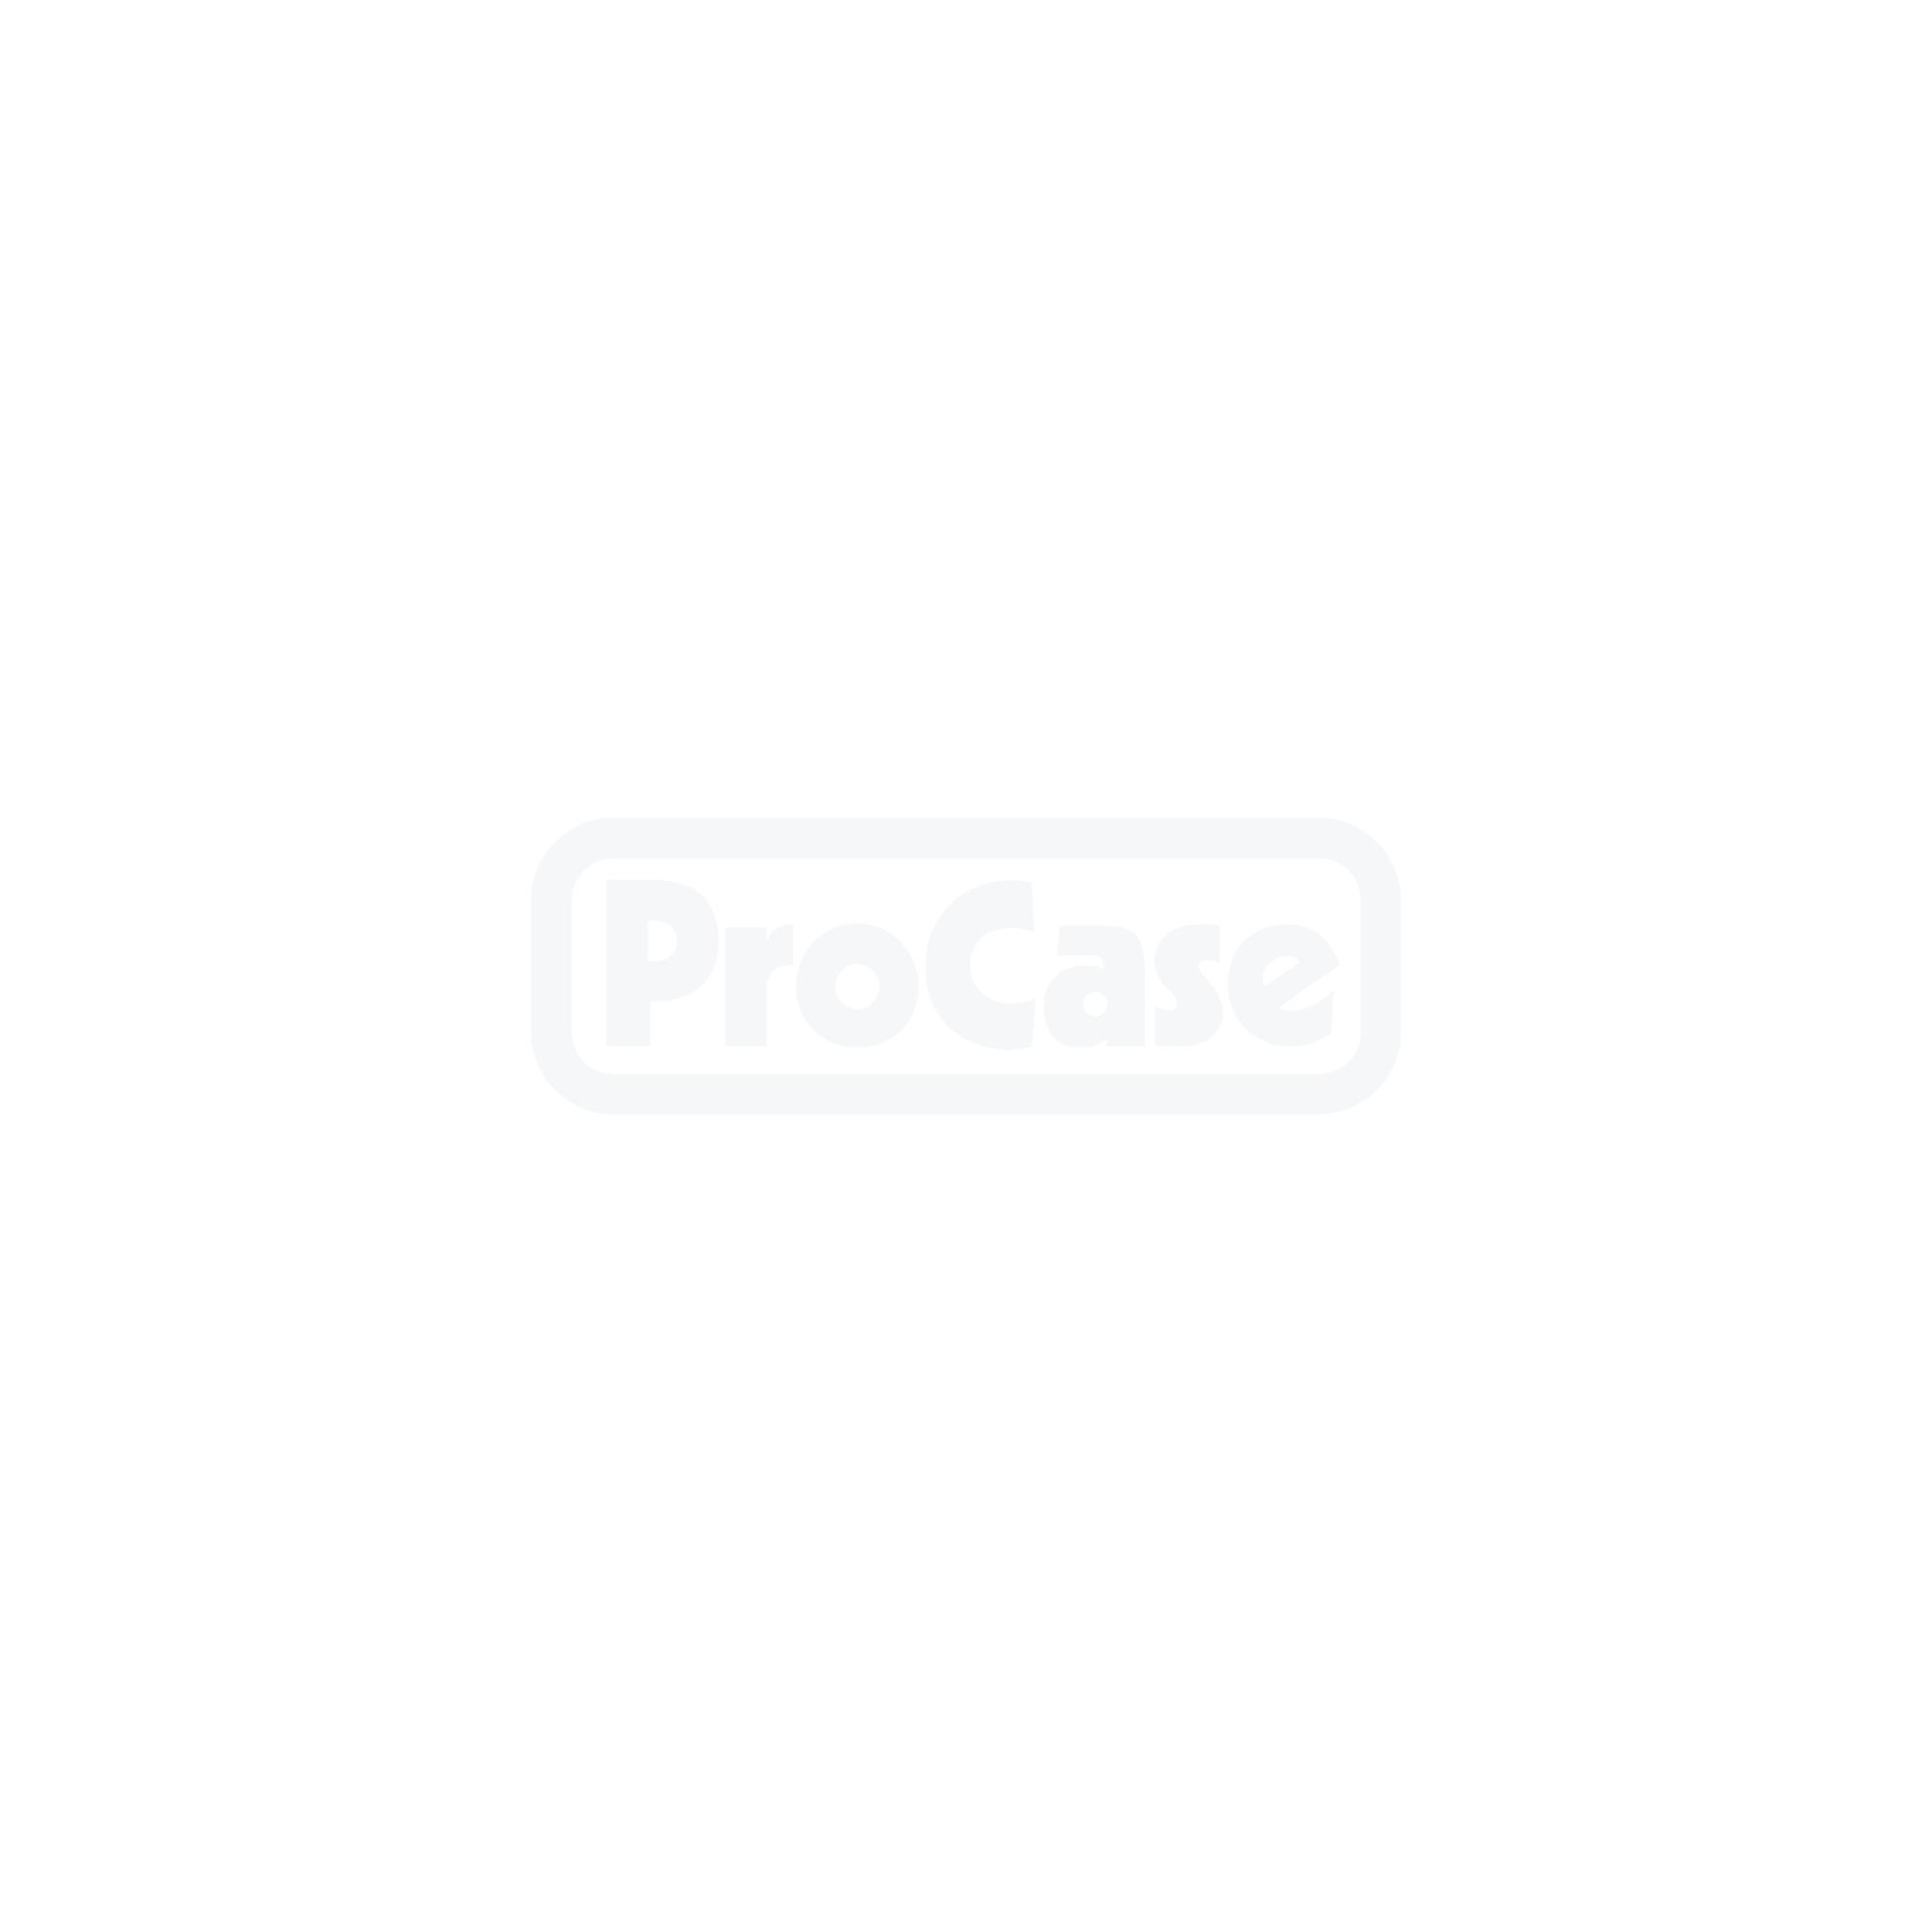 QSD-Rack Stack-Rack Adapterplatte 600 tief